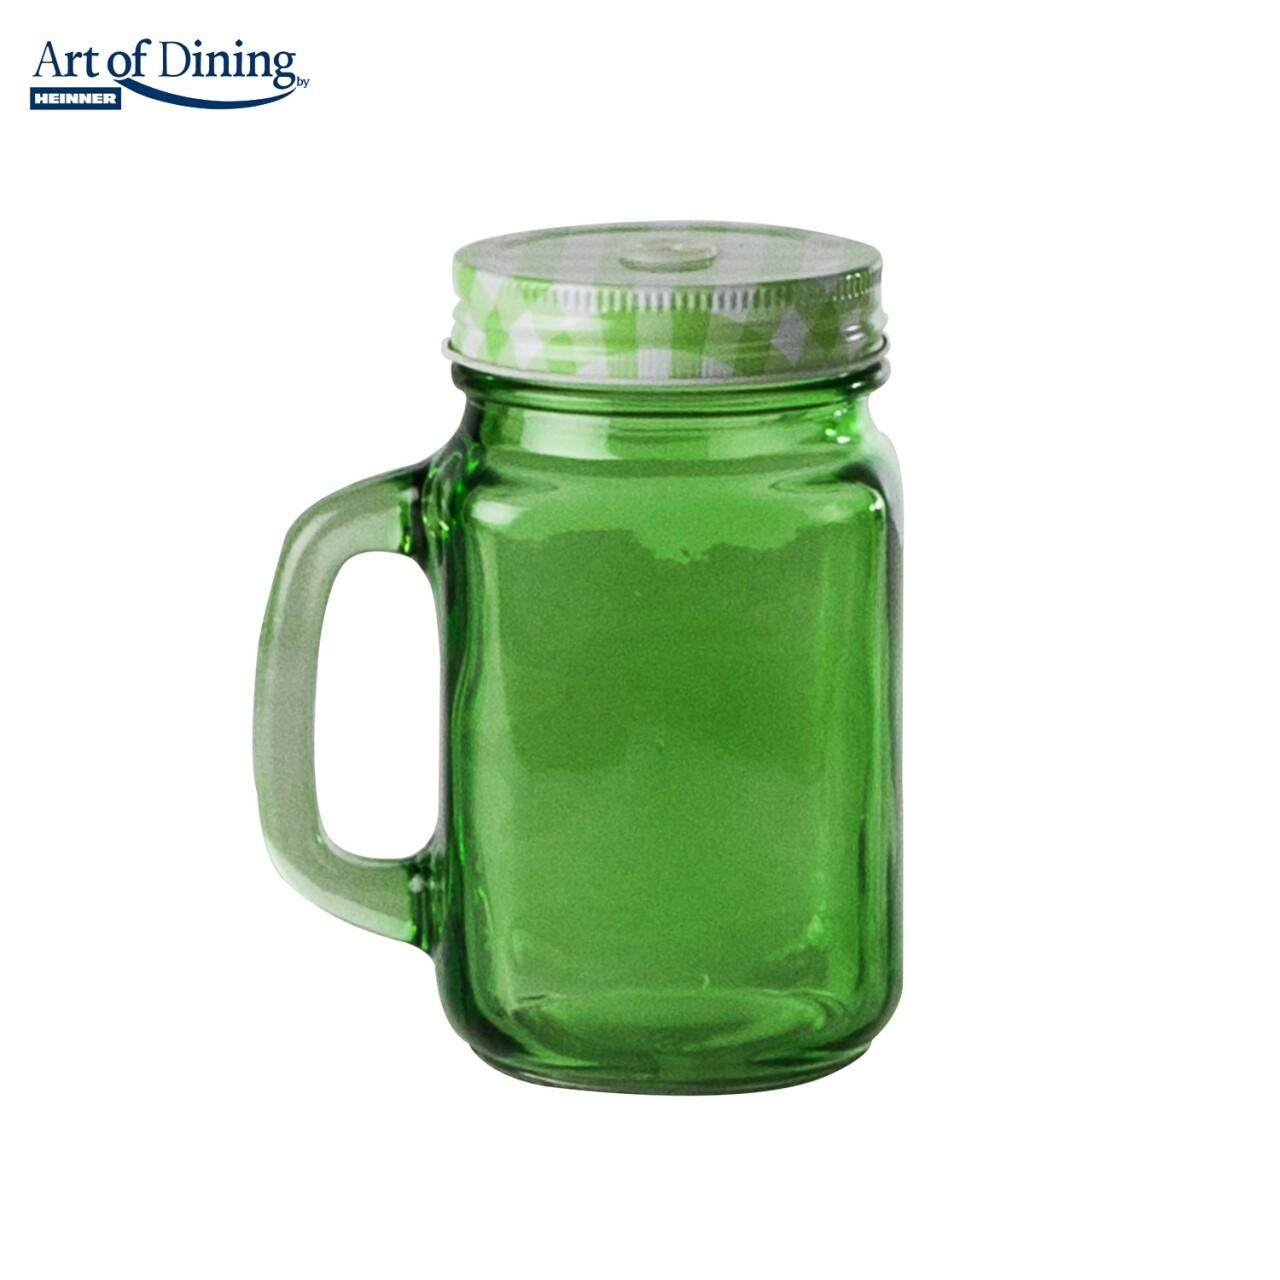 Halba tip borcan cu capac perforat Green, Heinner Home, 400 ml, sticla/metal, verde